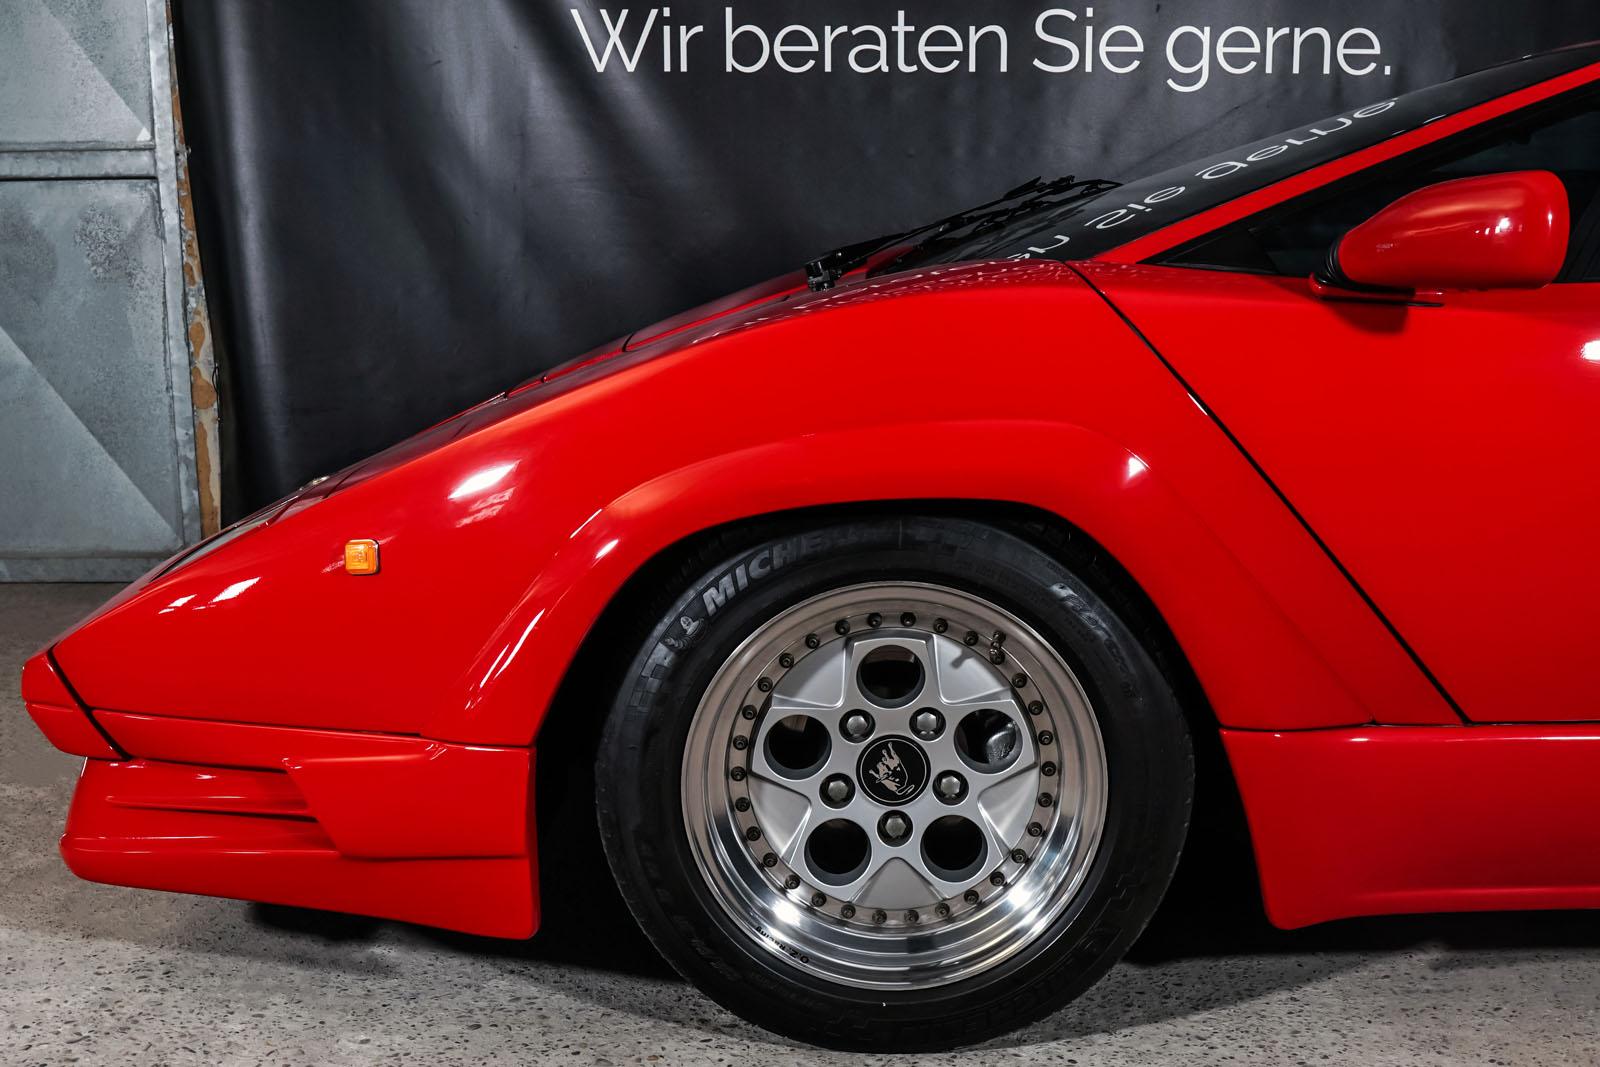 Lamborghini_Countach_Rot_Schwarz_LAM-2811_5_w